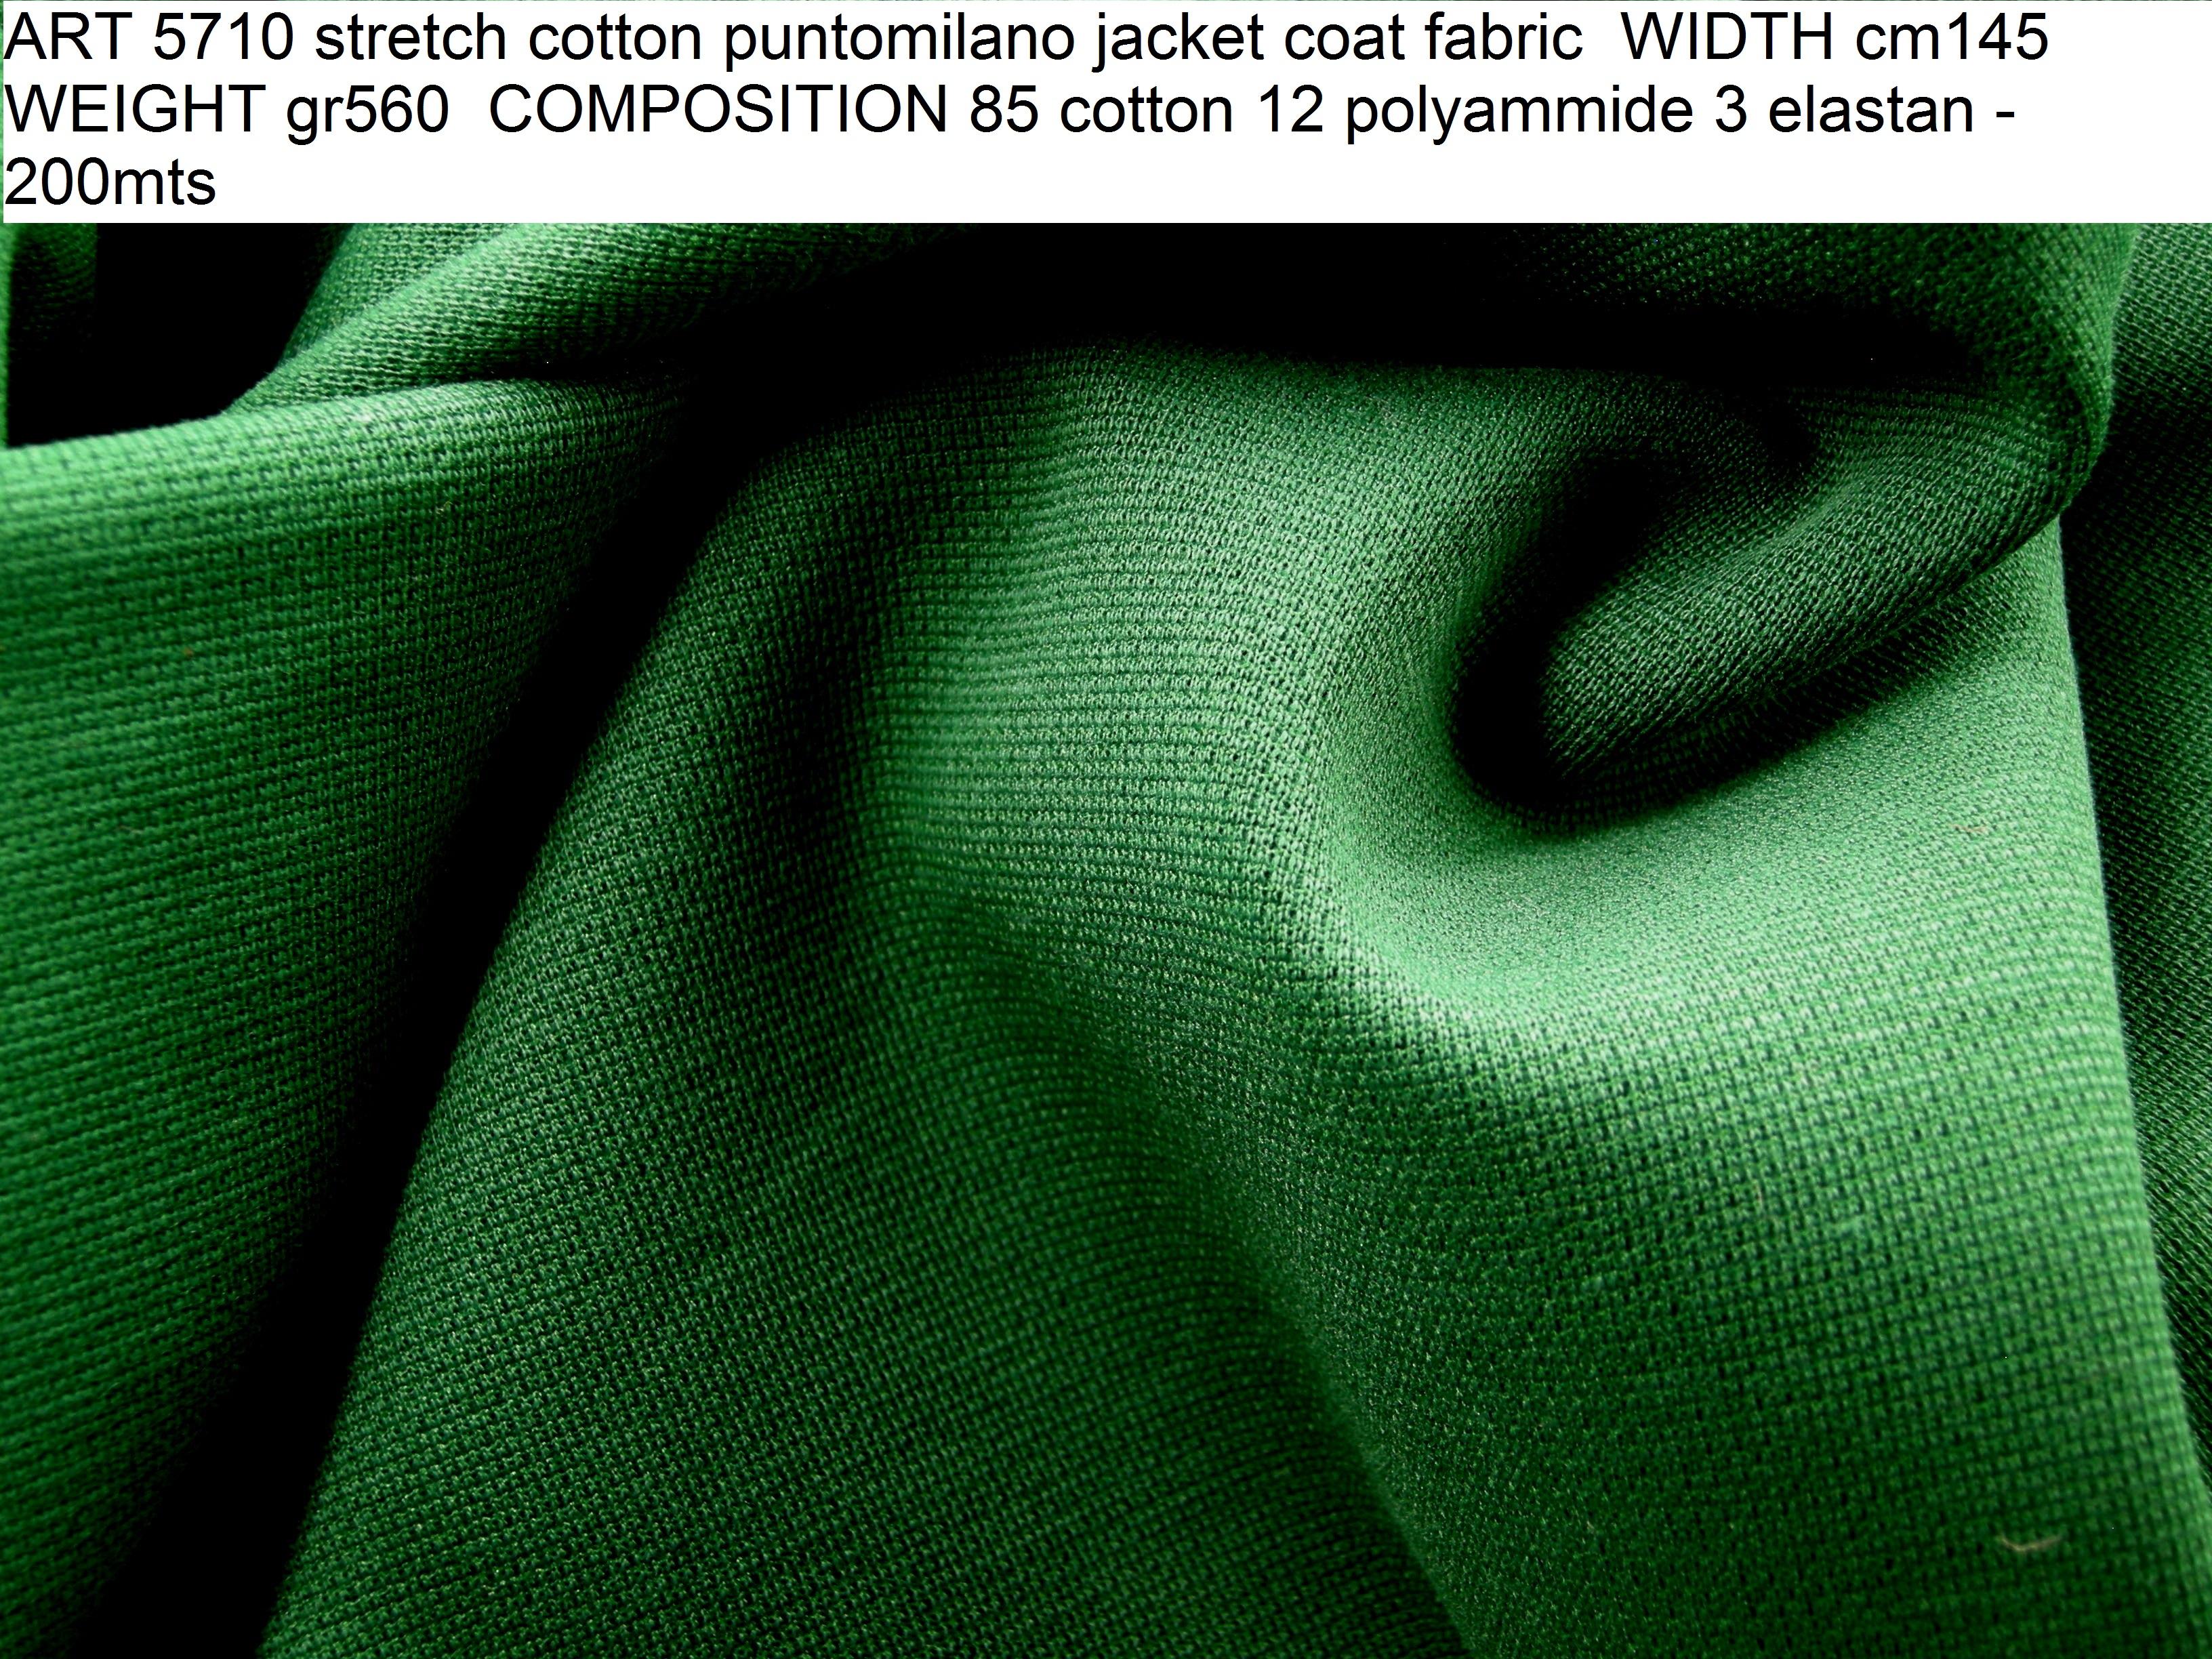 ART 5710 stretch cotton puntomilano jacket coat fabric WIDTH cm145 WEIGHT gr560 COMPOSITION 85 cotton 12 polyammide 3 elastan - 200mts